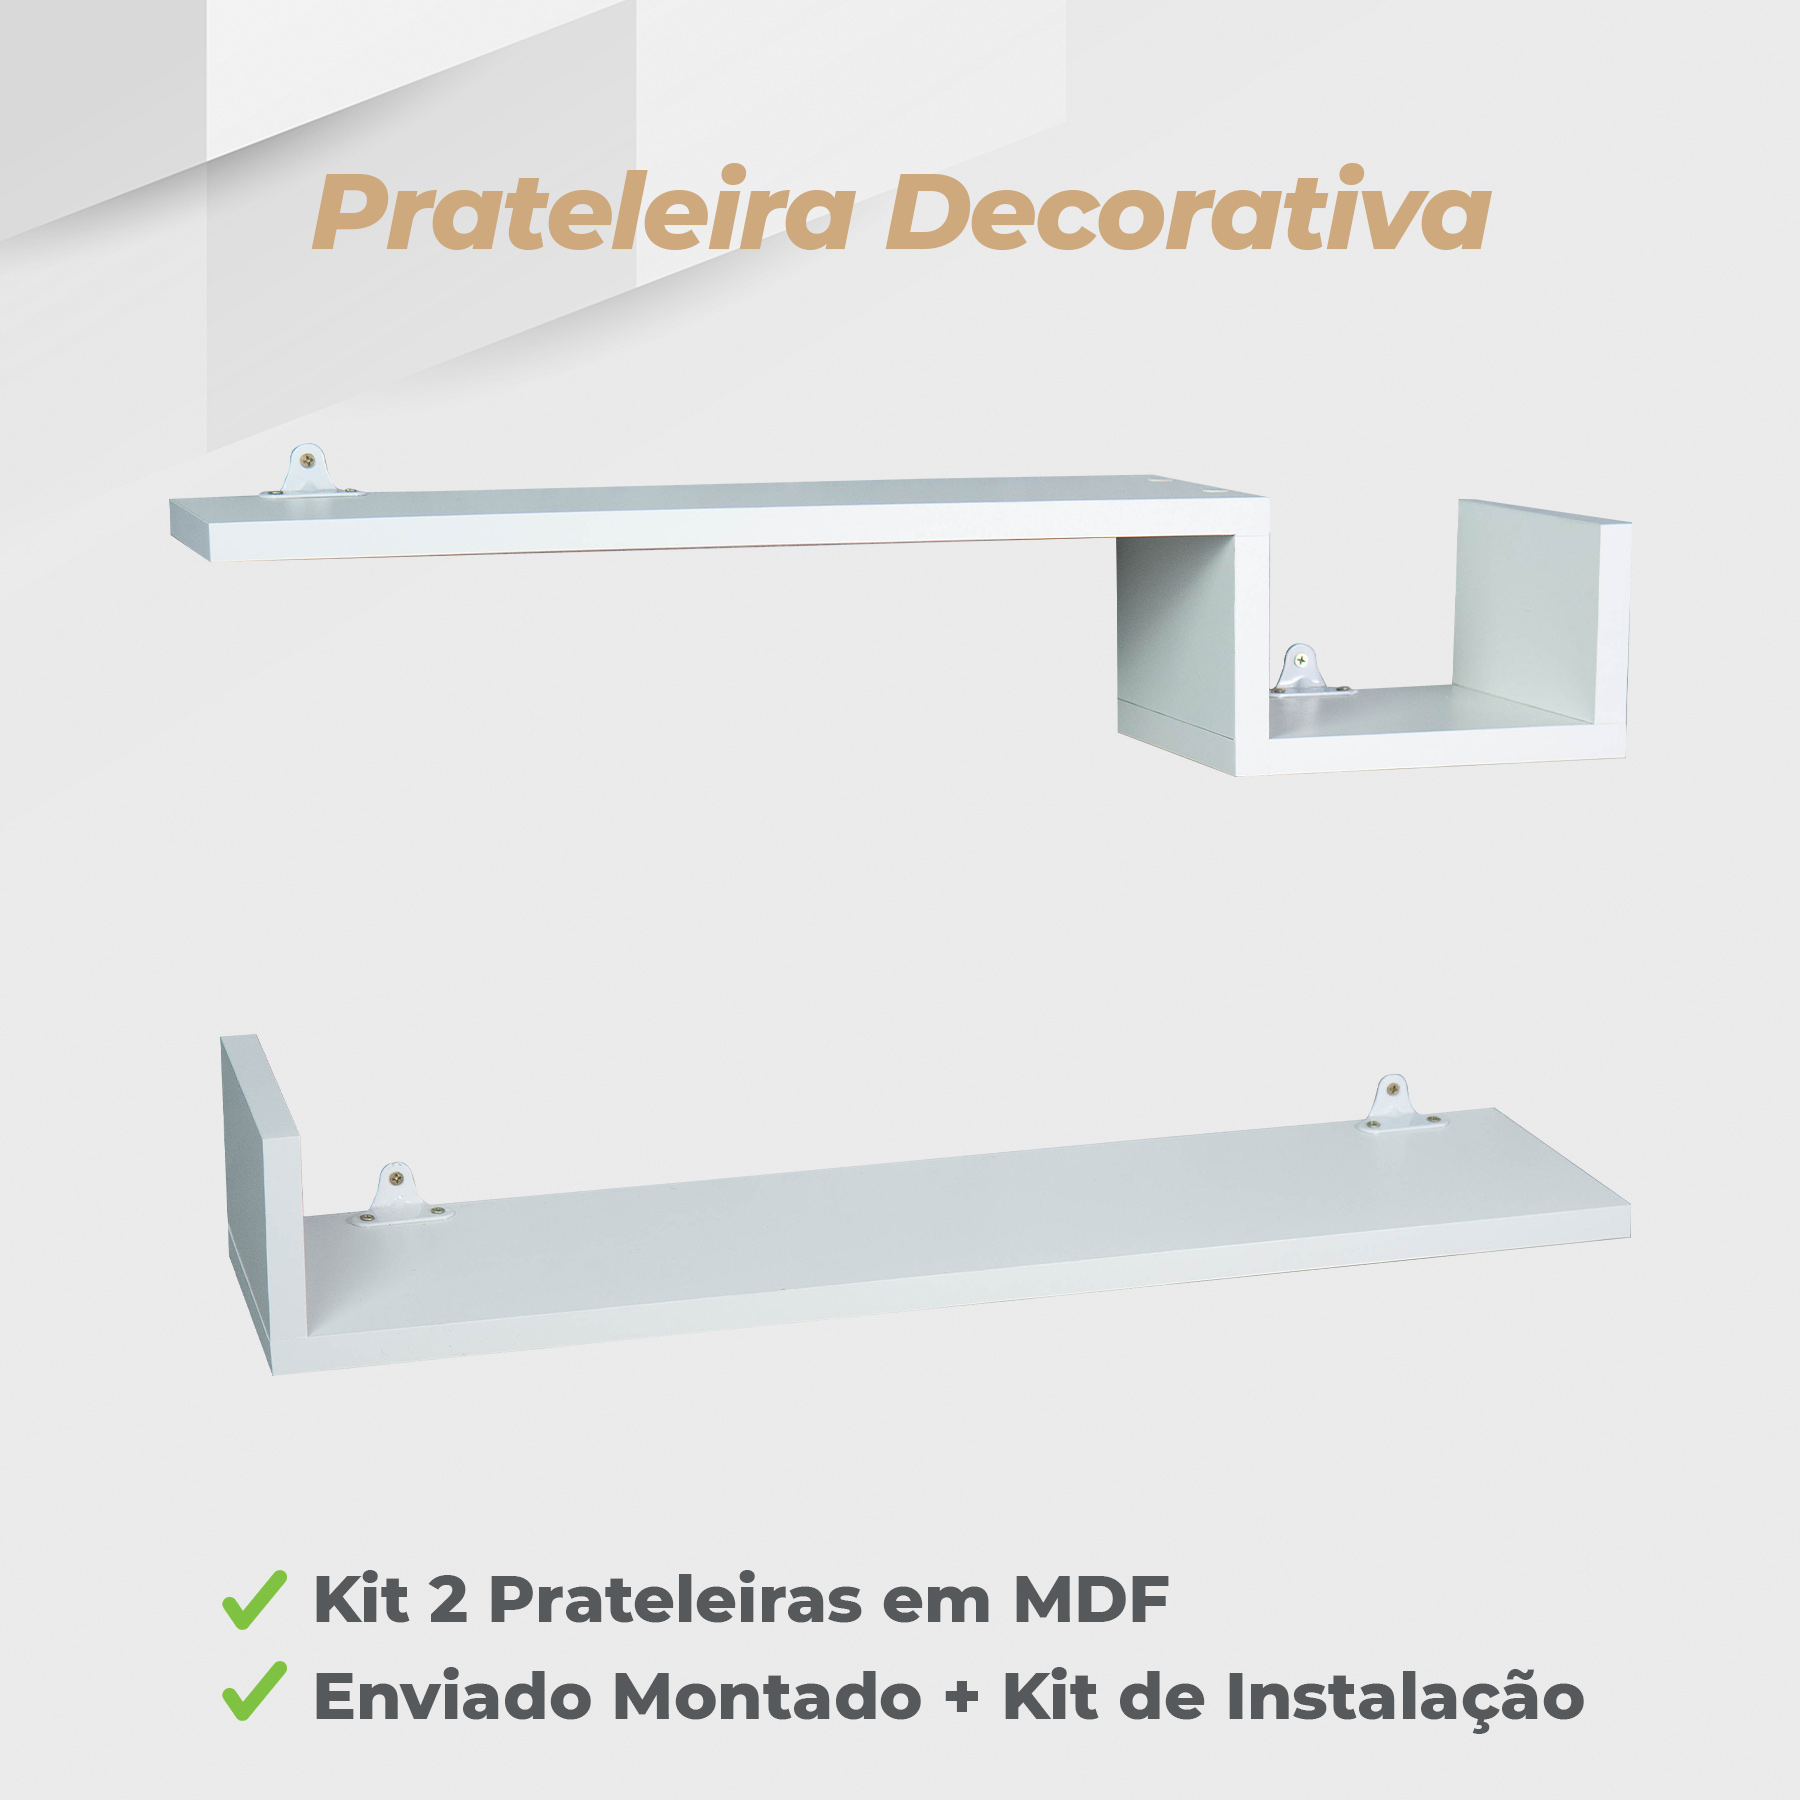 Kit Prateleira Decorativa 15x60cm MDF Branco - 2 Unidades